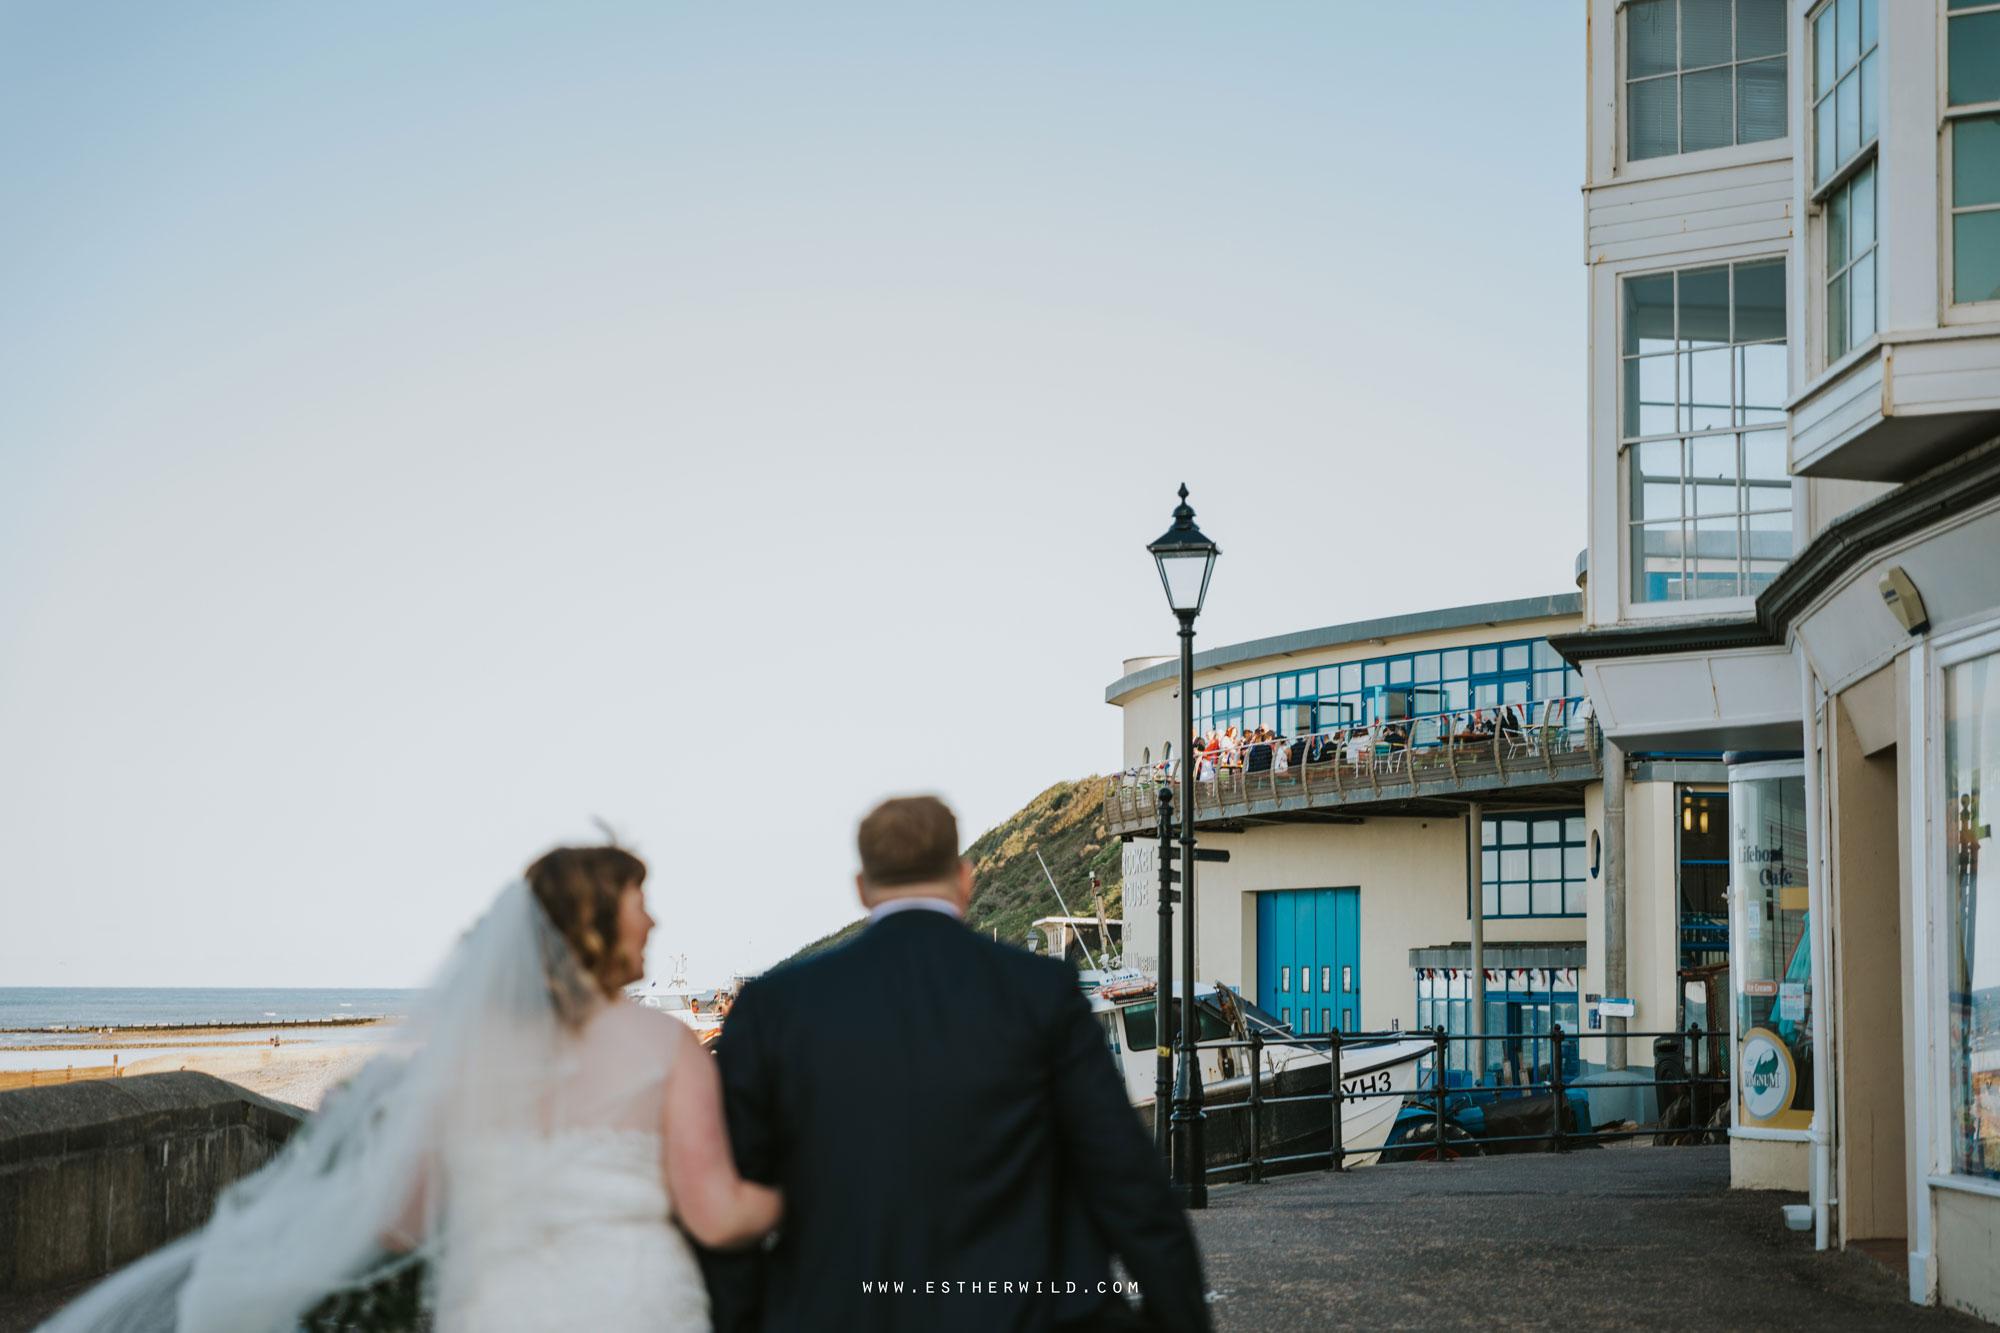 Cromer_Wedding_Beach_Outdoor_Ceremony_Norfolk_North_Lodge_Registry_Office_Rocket_House_Cafe_Cromer_Pier_IMG_4739.jpg